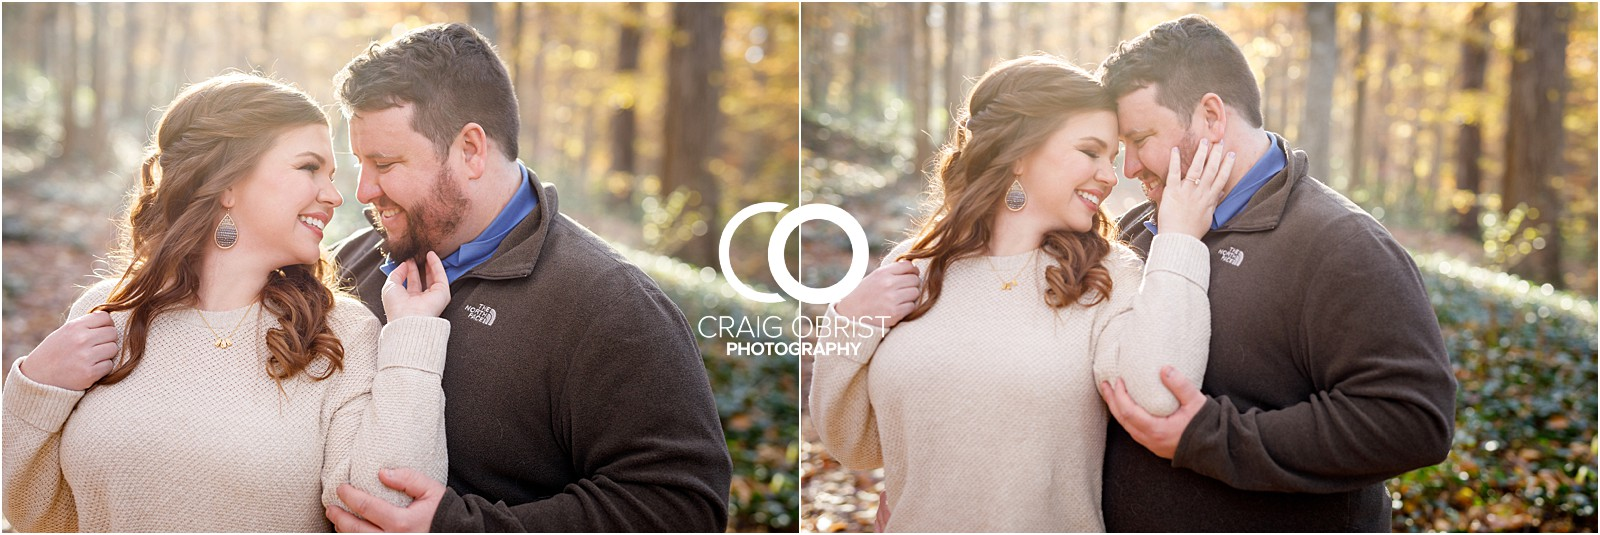 Cator Woolford Gardens Piedmont Park Engagement Portraits_0008.jpg